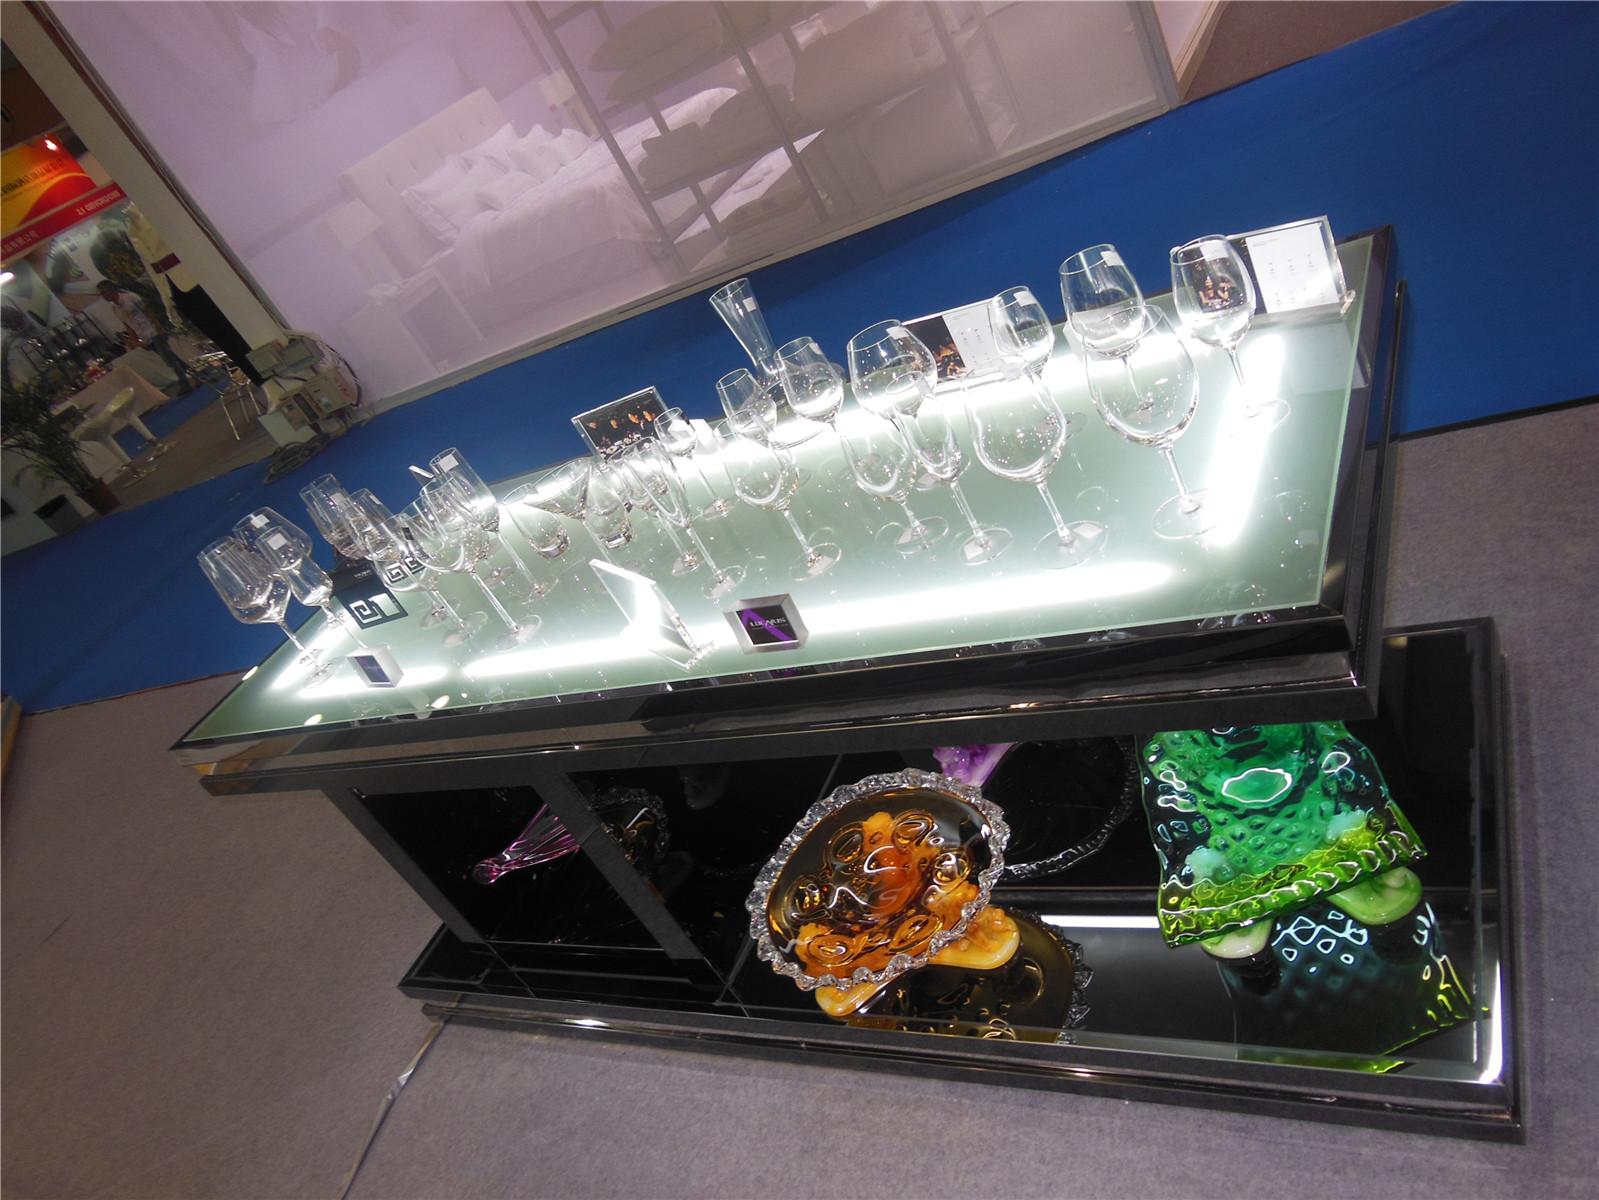 Guangzhou pazhou exhibition-Tontile Glasses